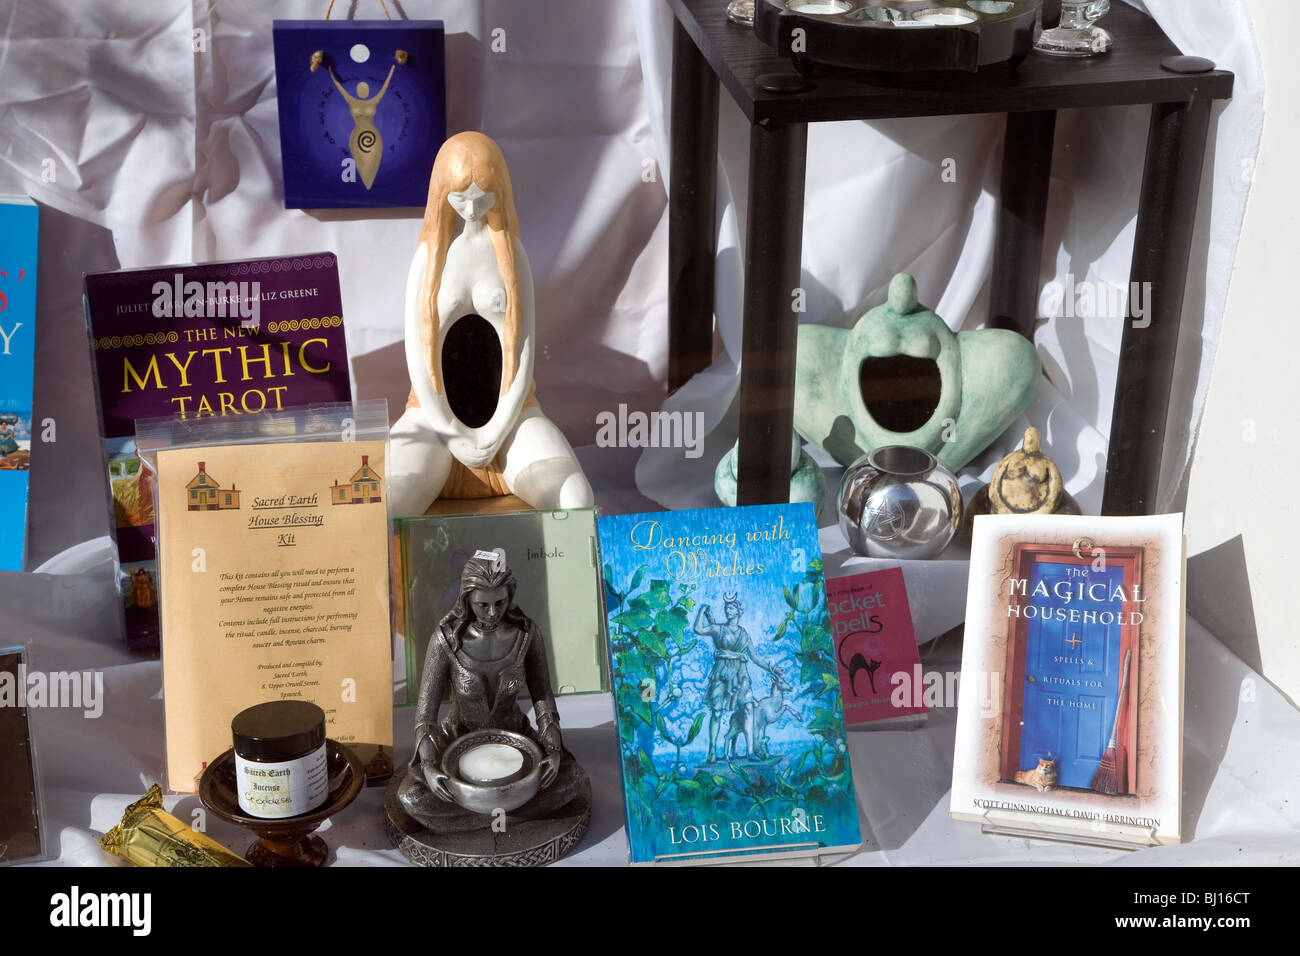 Window display in alternative mystical shop - Stock Image